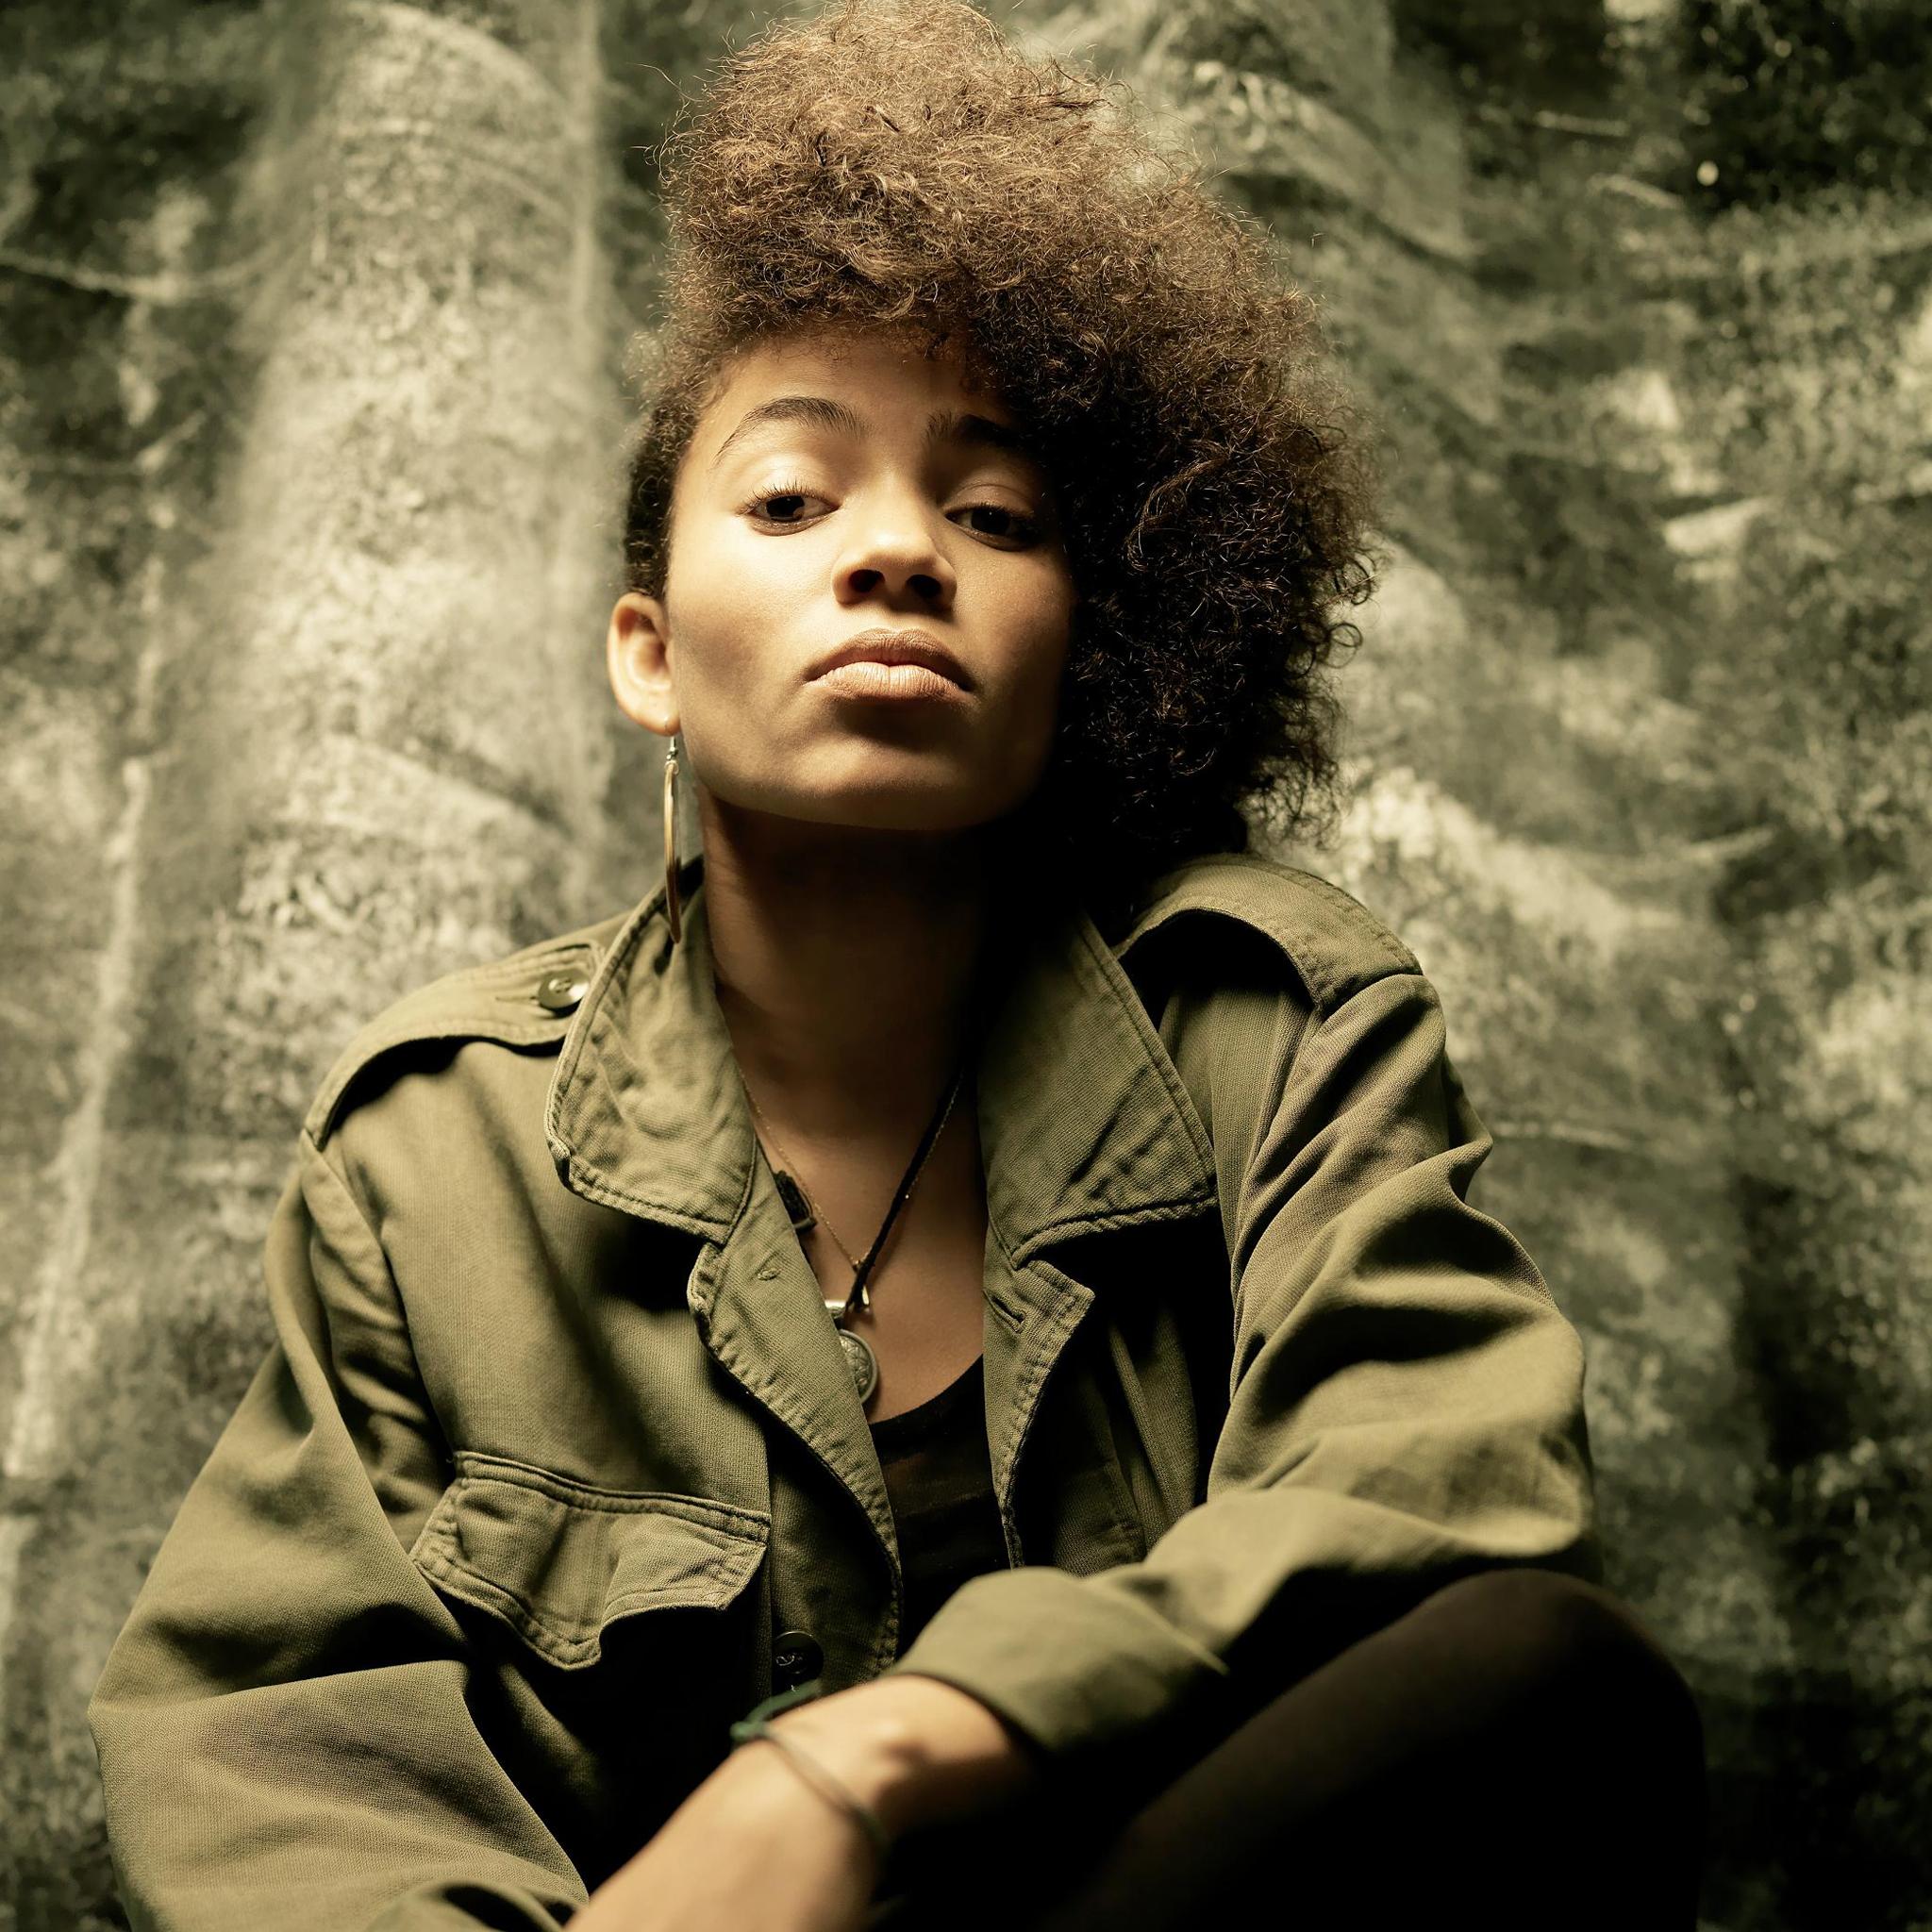 Nneka-3Wallpapers-iPad-Retina